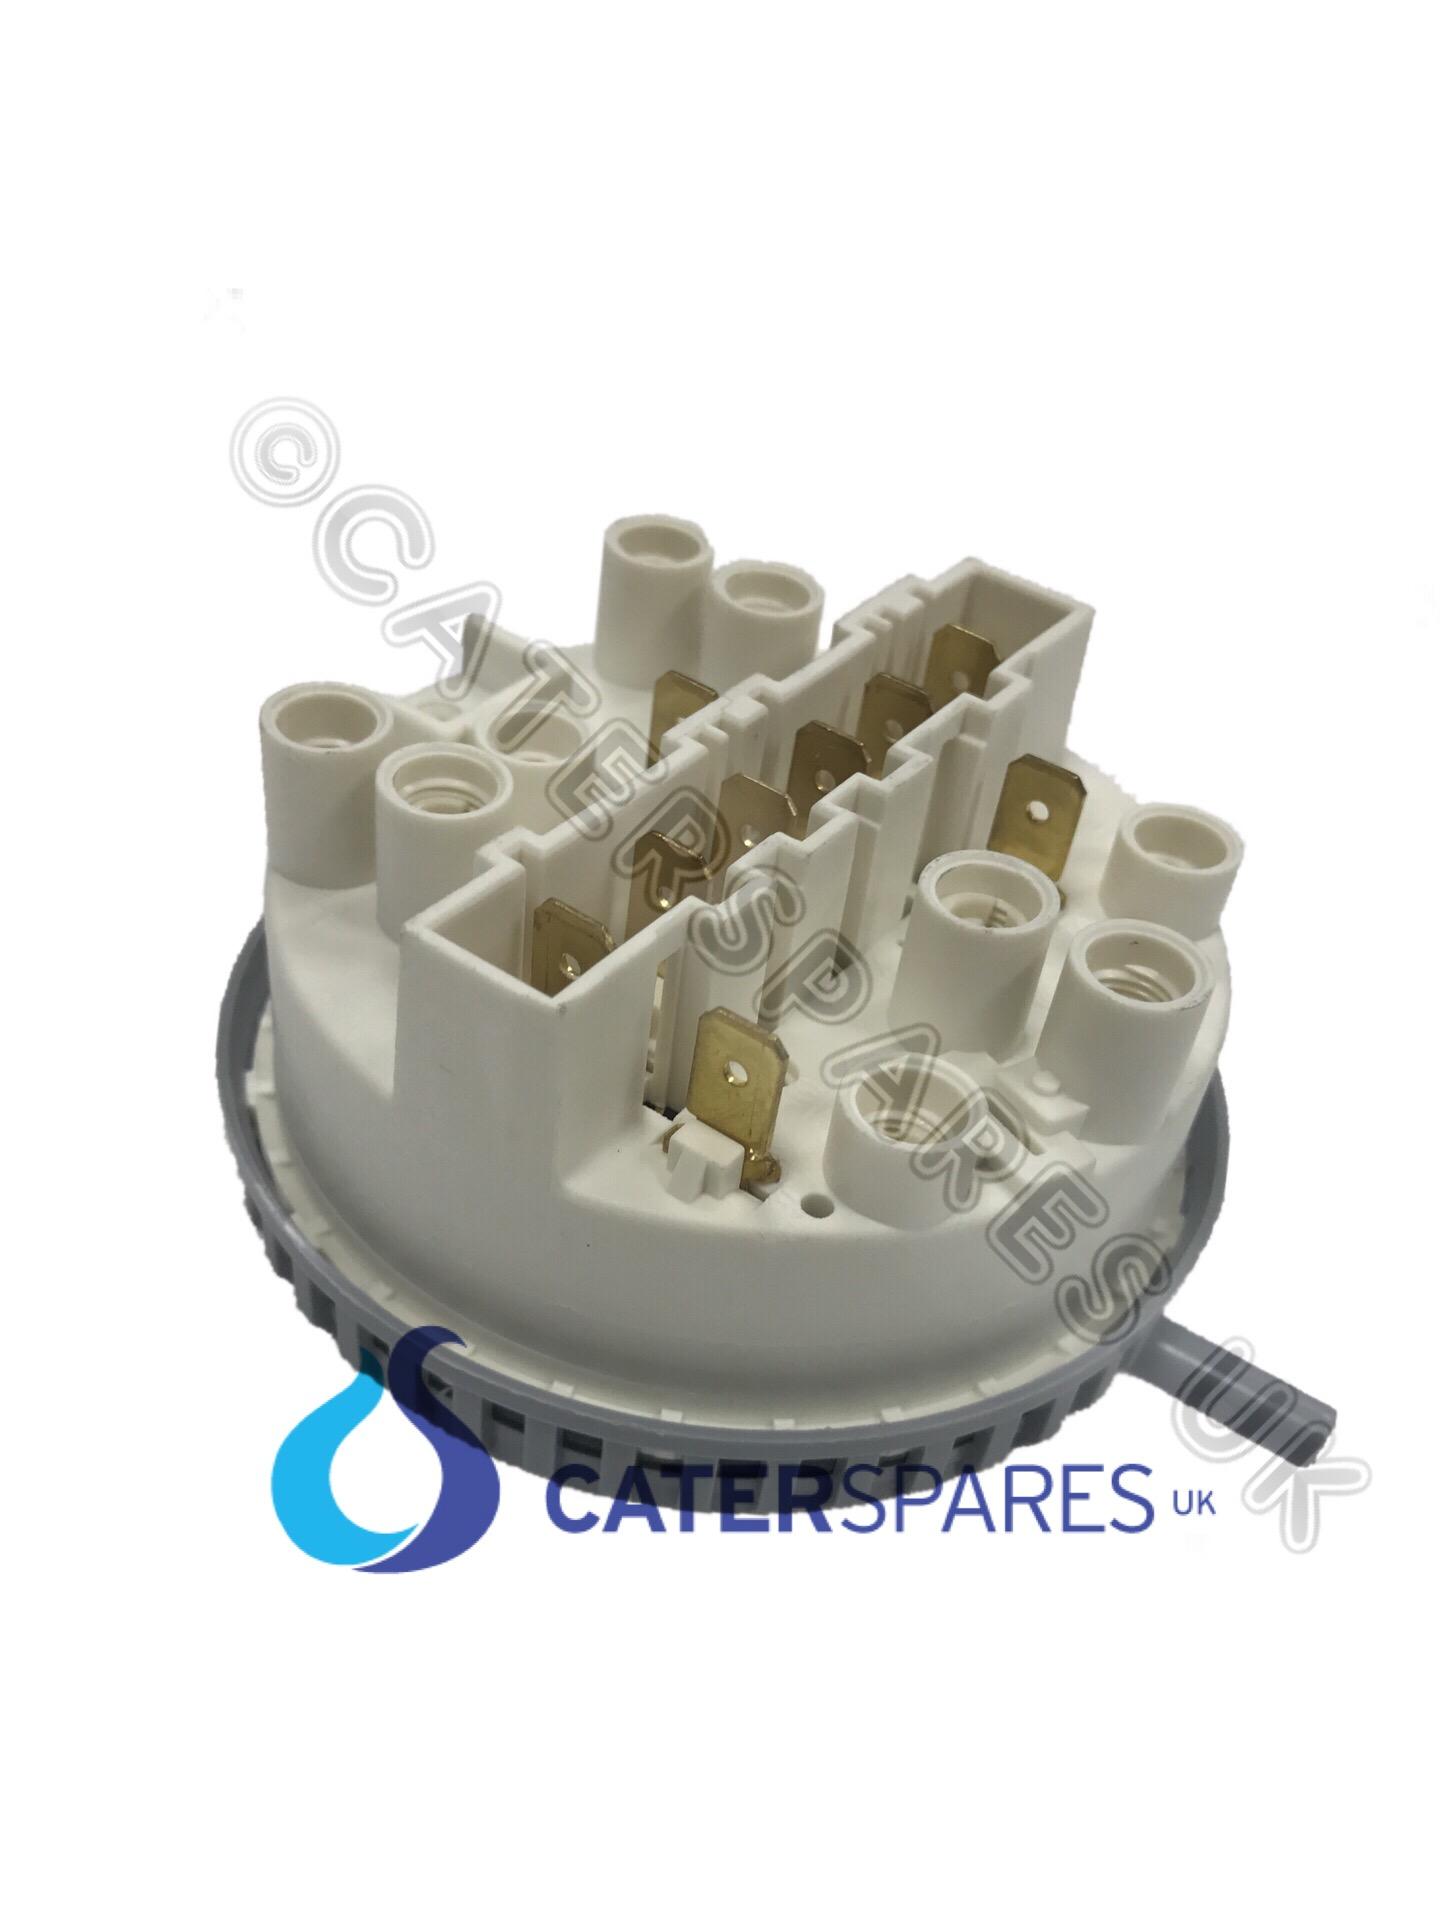 130628 Comenda Dishwasher Air Pressure Switch 3 Level